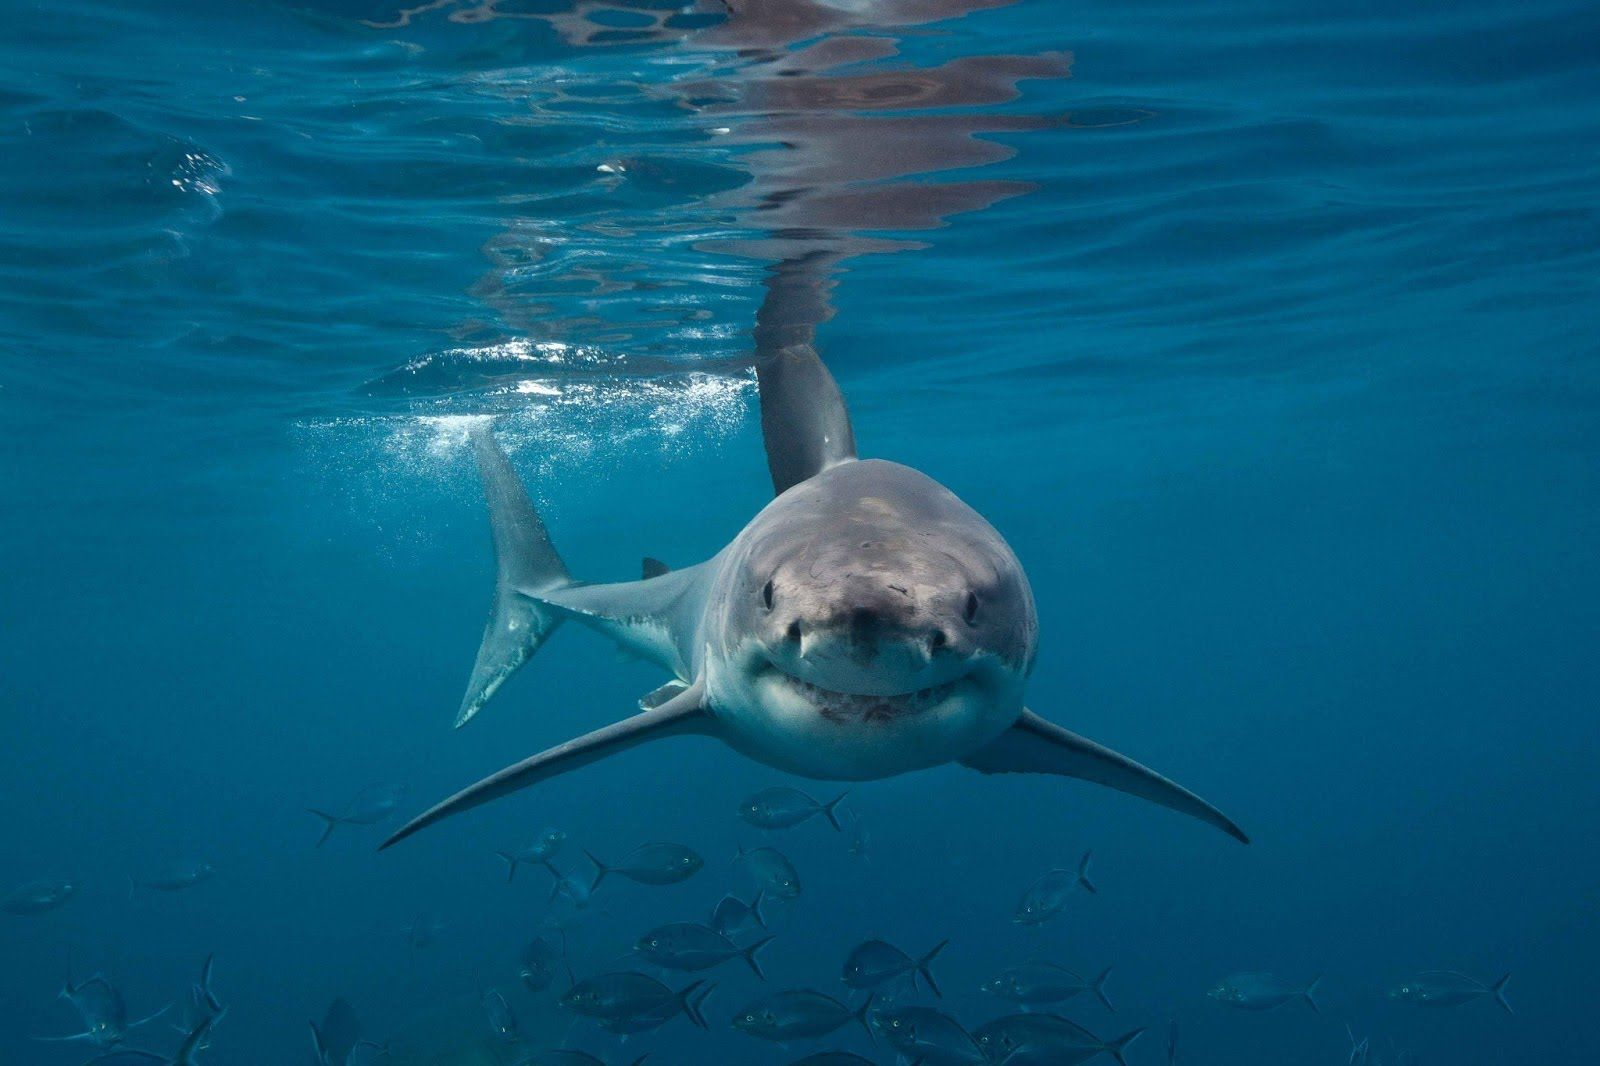 Australia's Deadliest Shark Coast Attacks Full Documentary